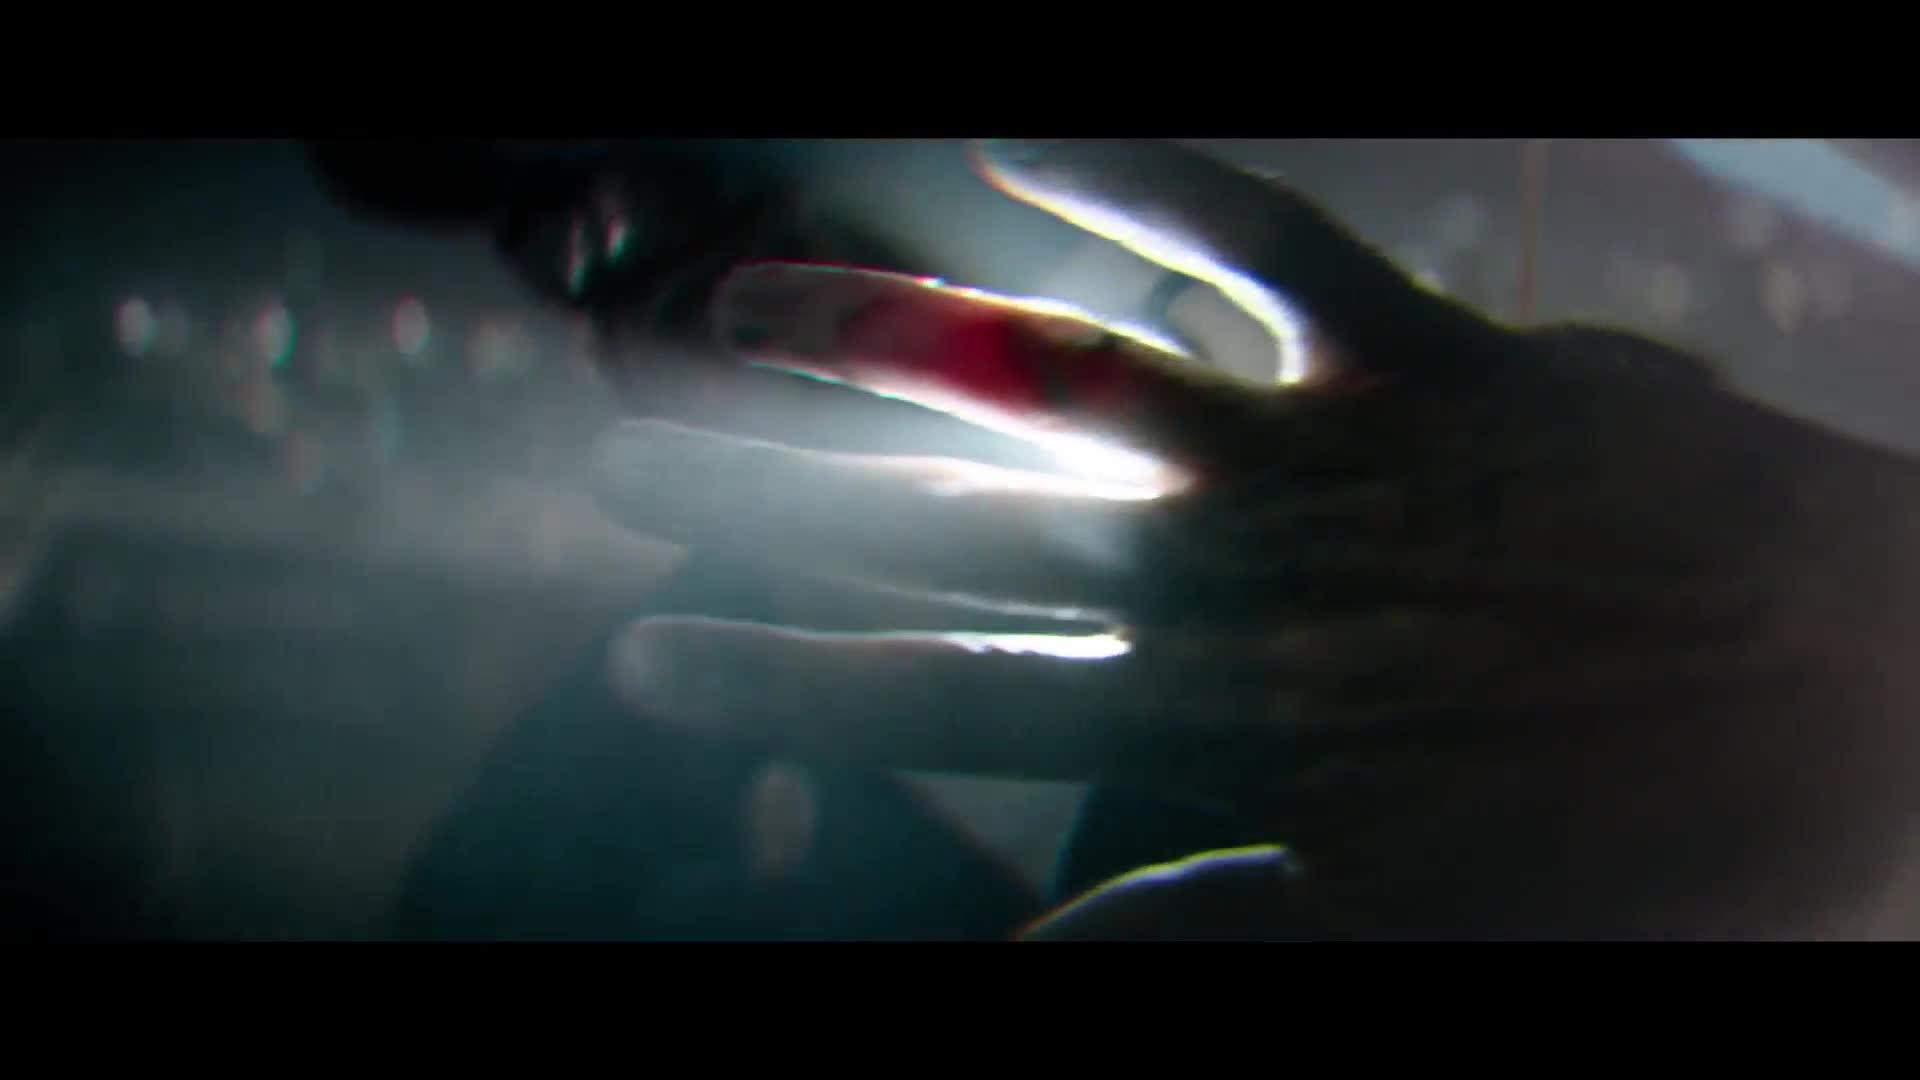 Terminator   Temny osud  Terminator Dark Fate   2019  CZ titulky v obraze